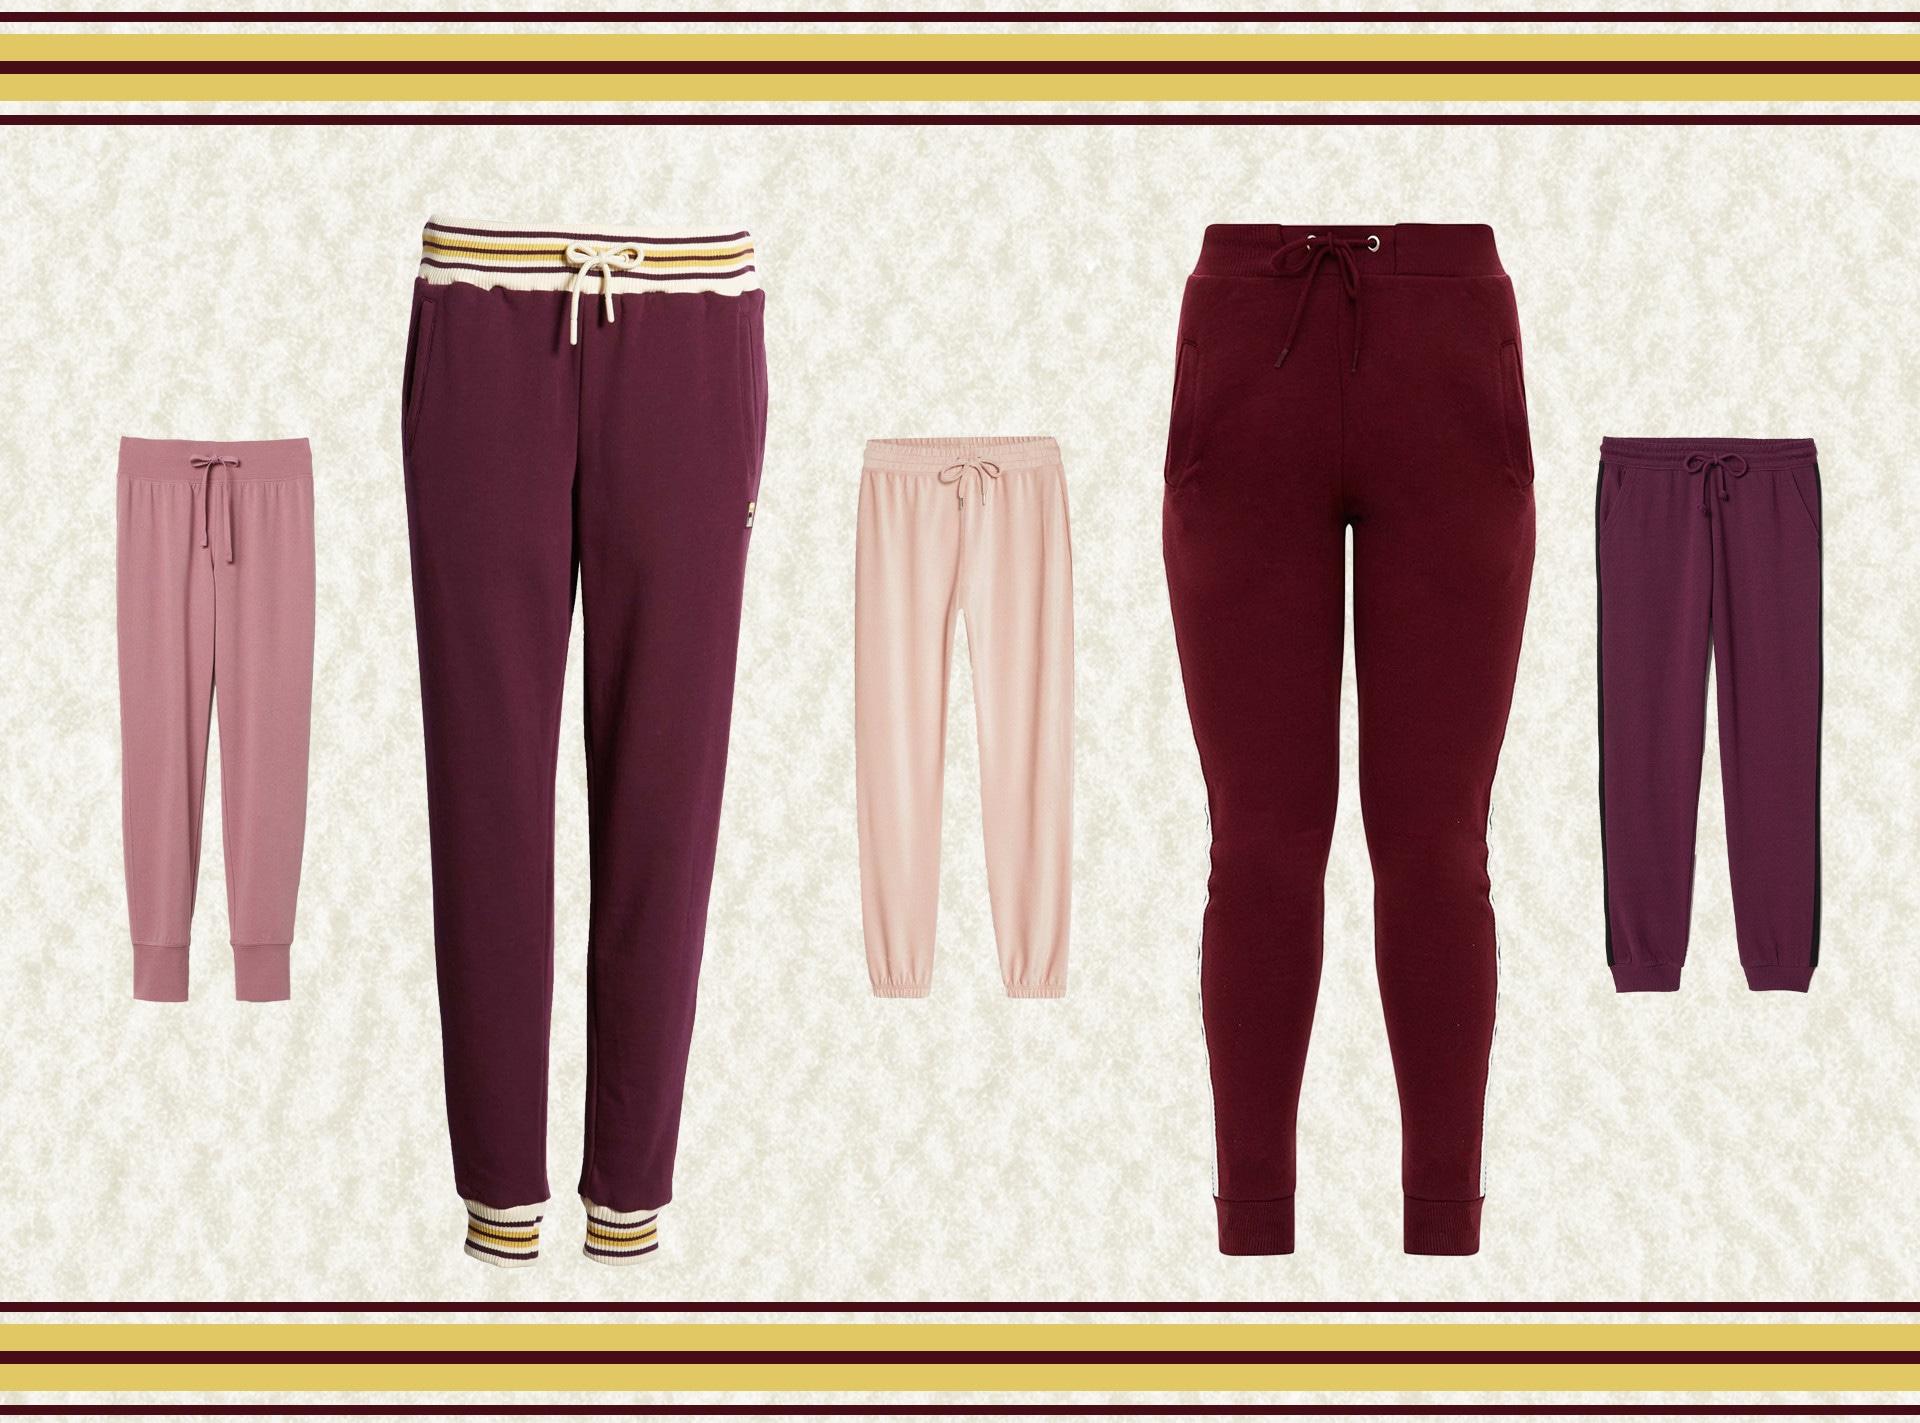 E-Comm: Sweatpants That Are Comfy & Cool